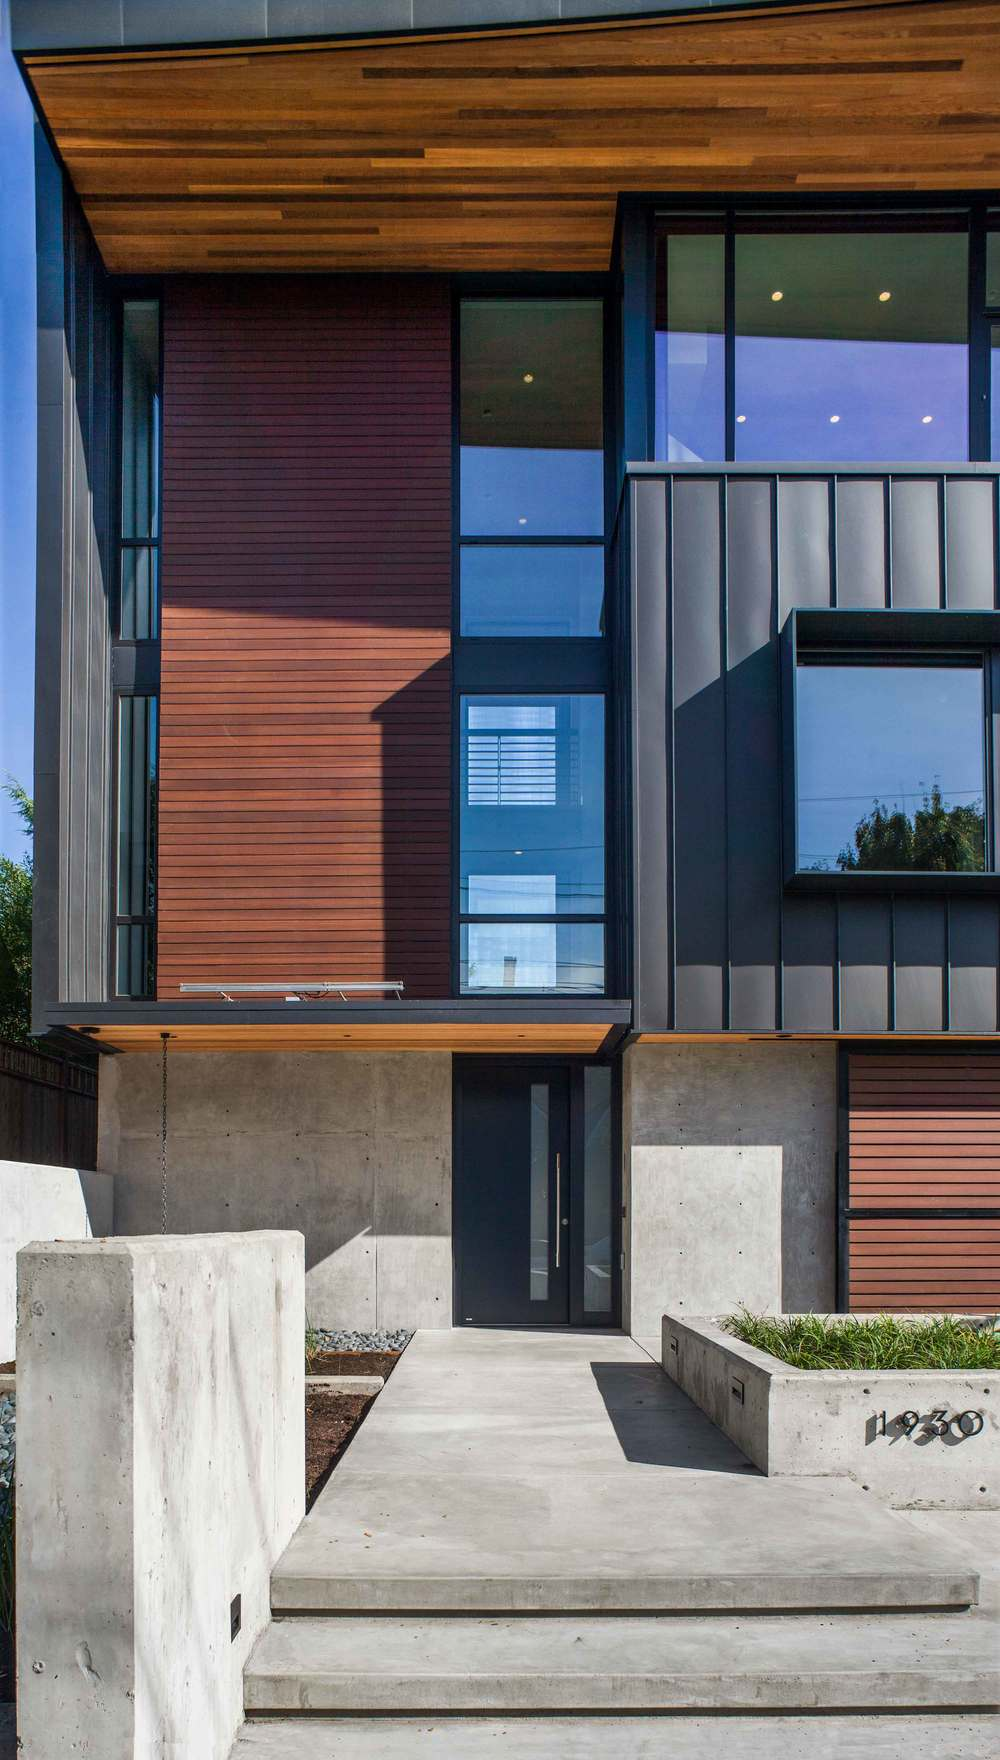 New-Century Modern, SE Portland<br><br><em>- Scott   Edwards Architecture -</em>